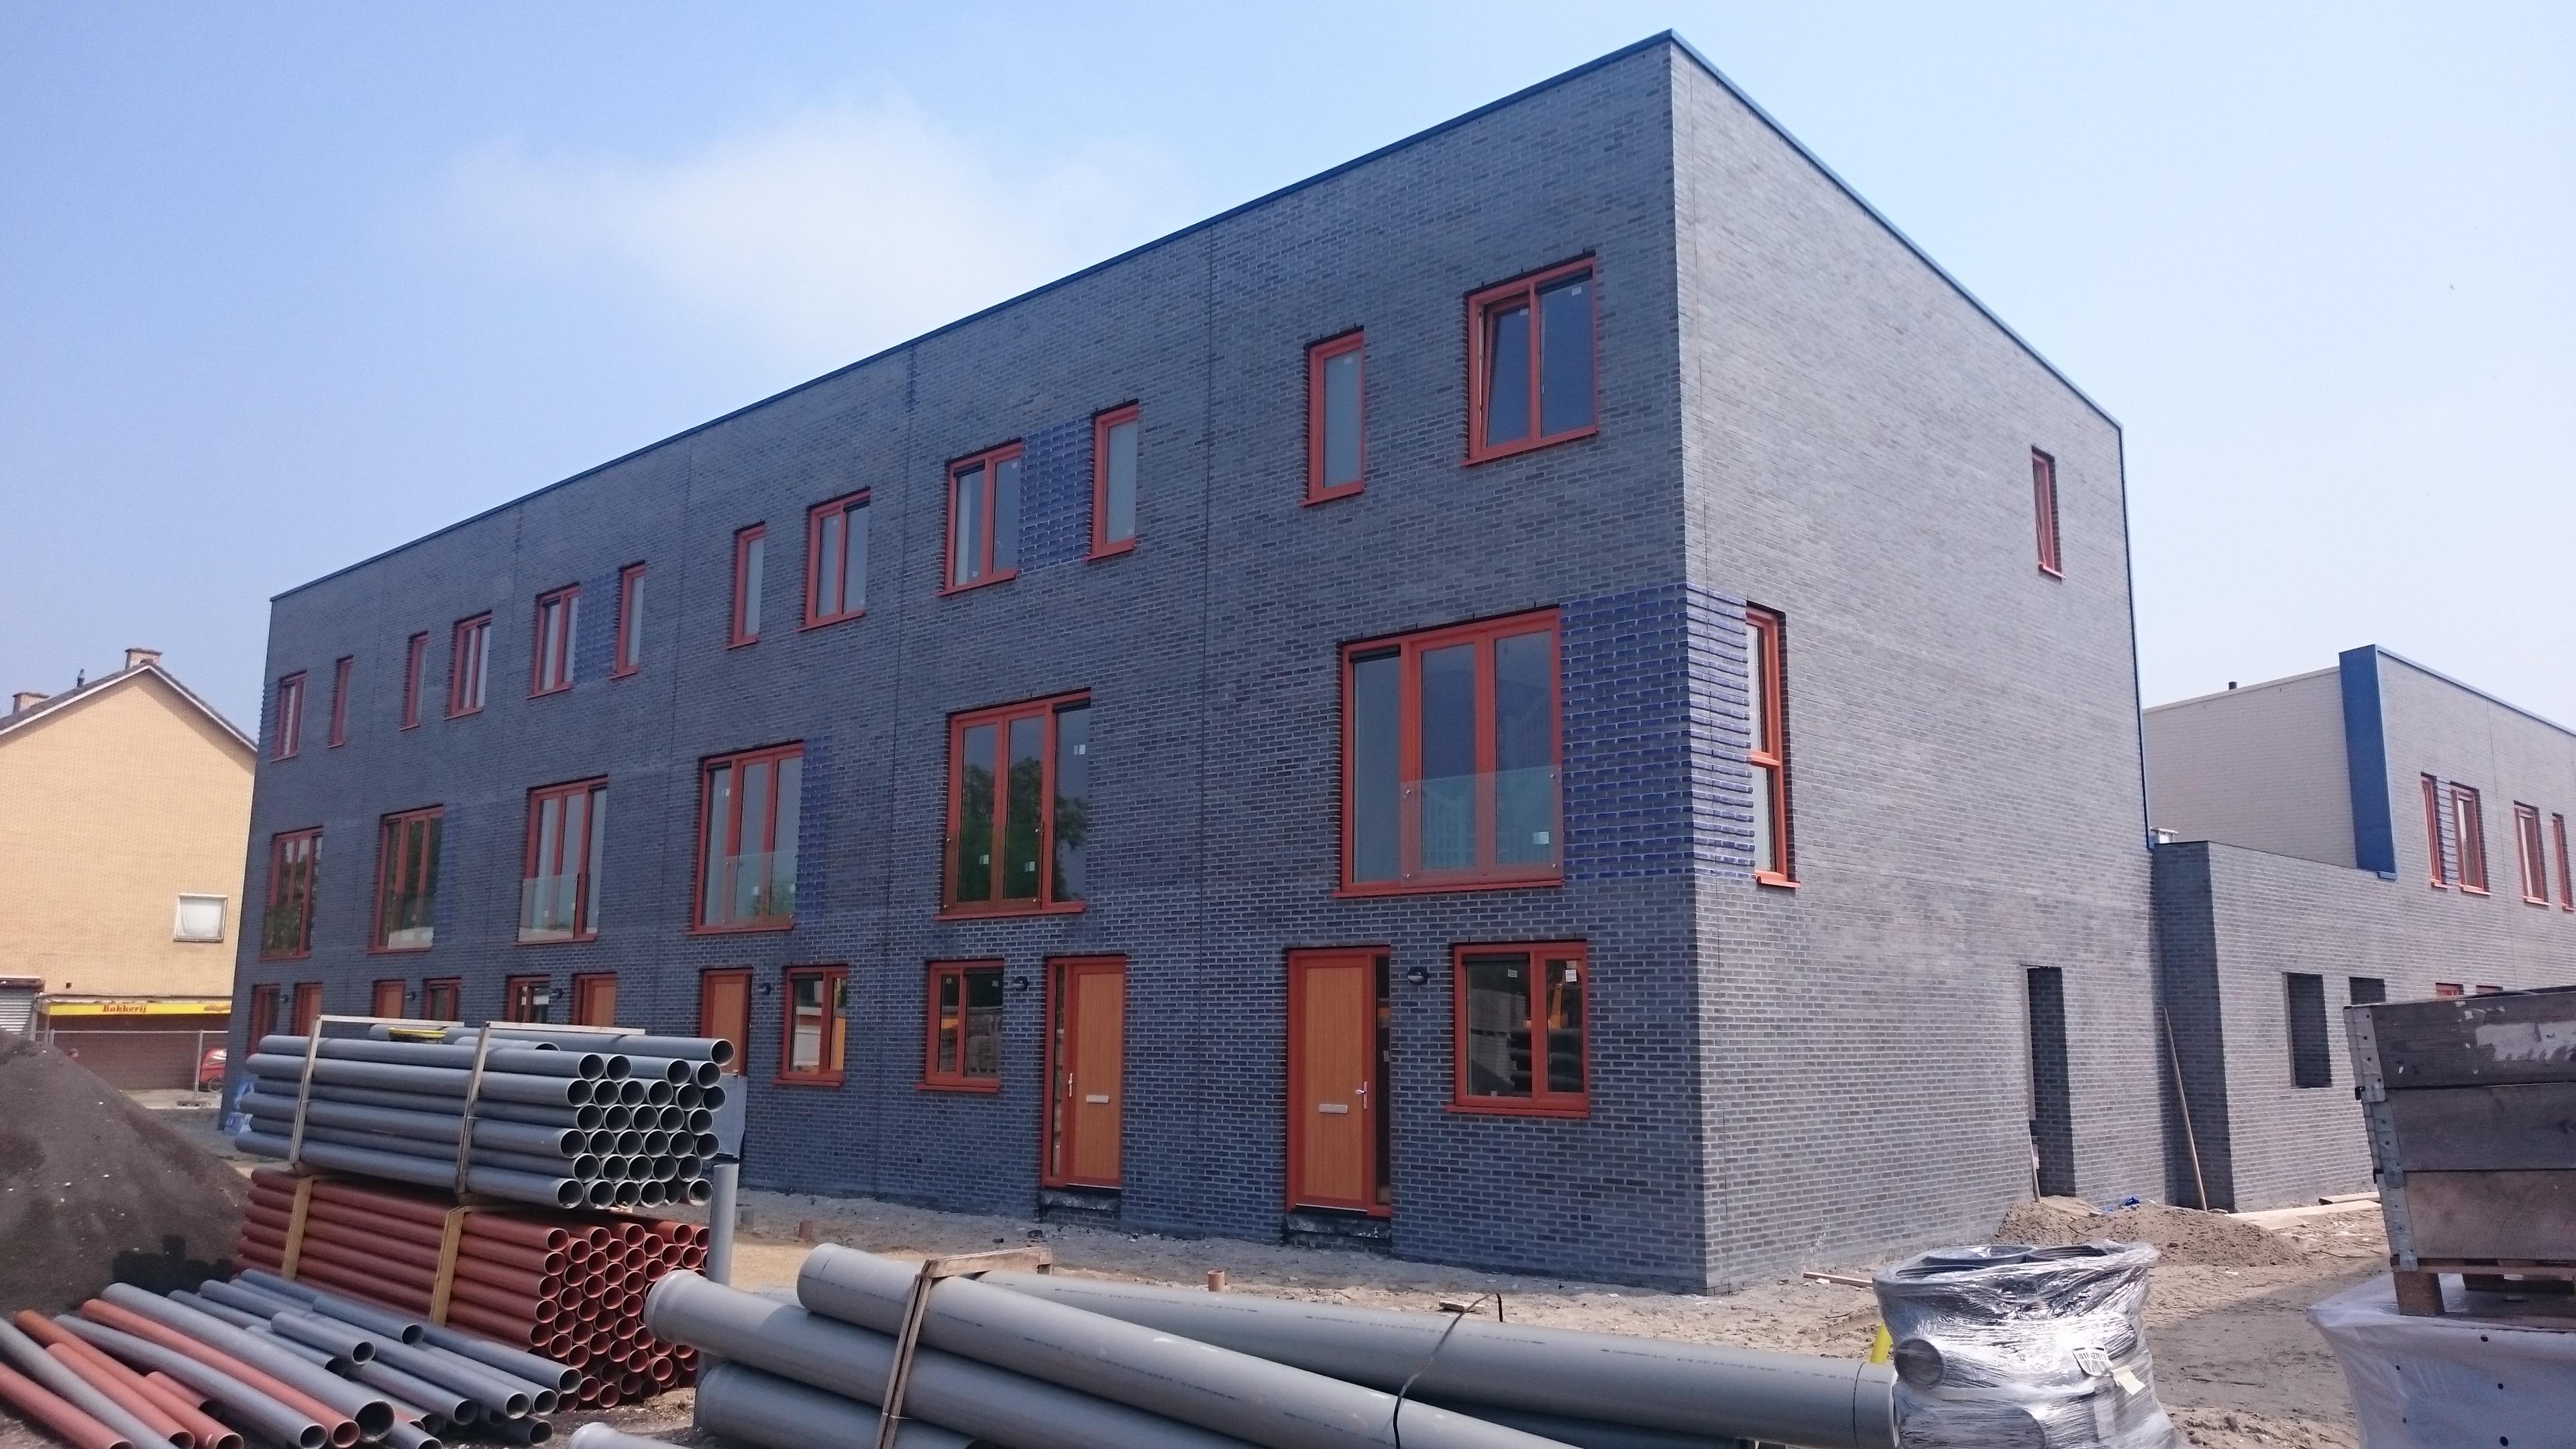 Nieuwbouw zsw gouda vordert snel a3 architecten for Gulden interieur rotterdam